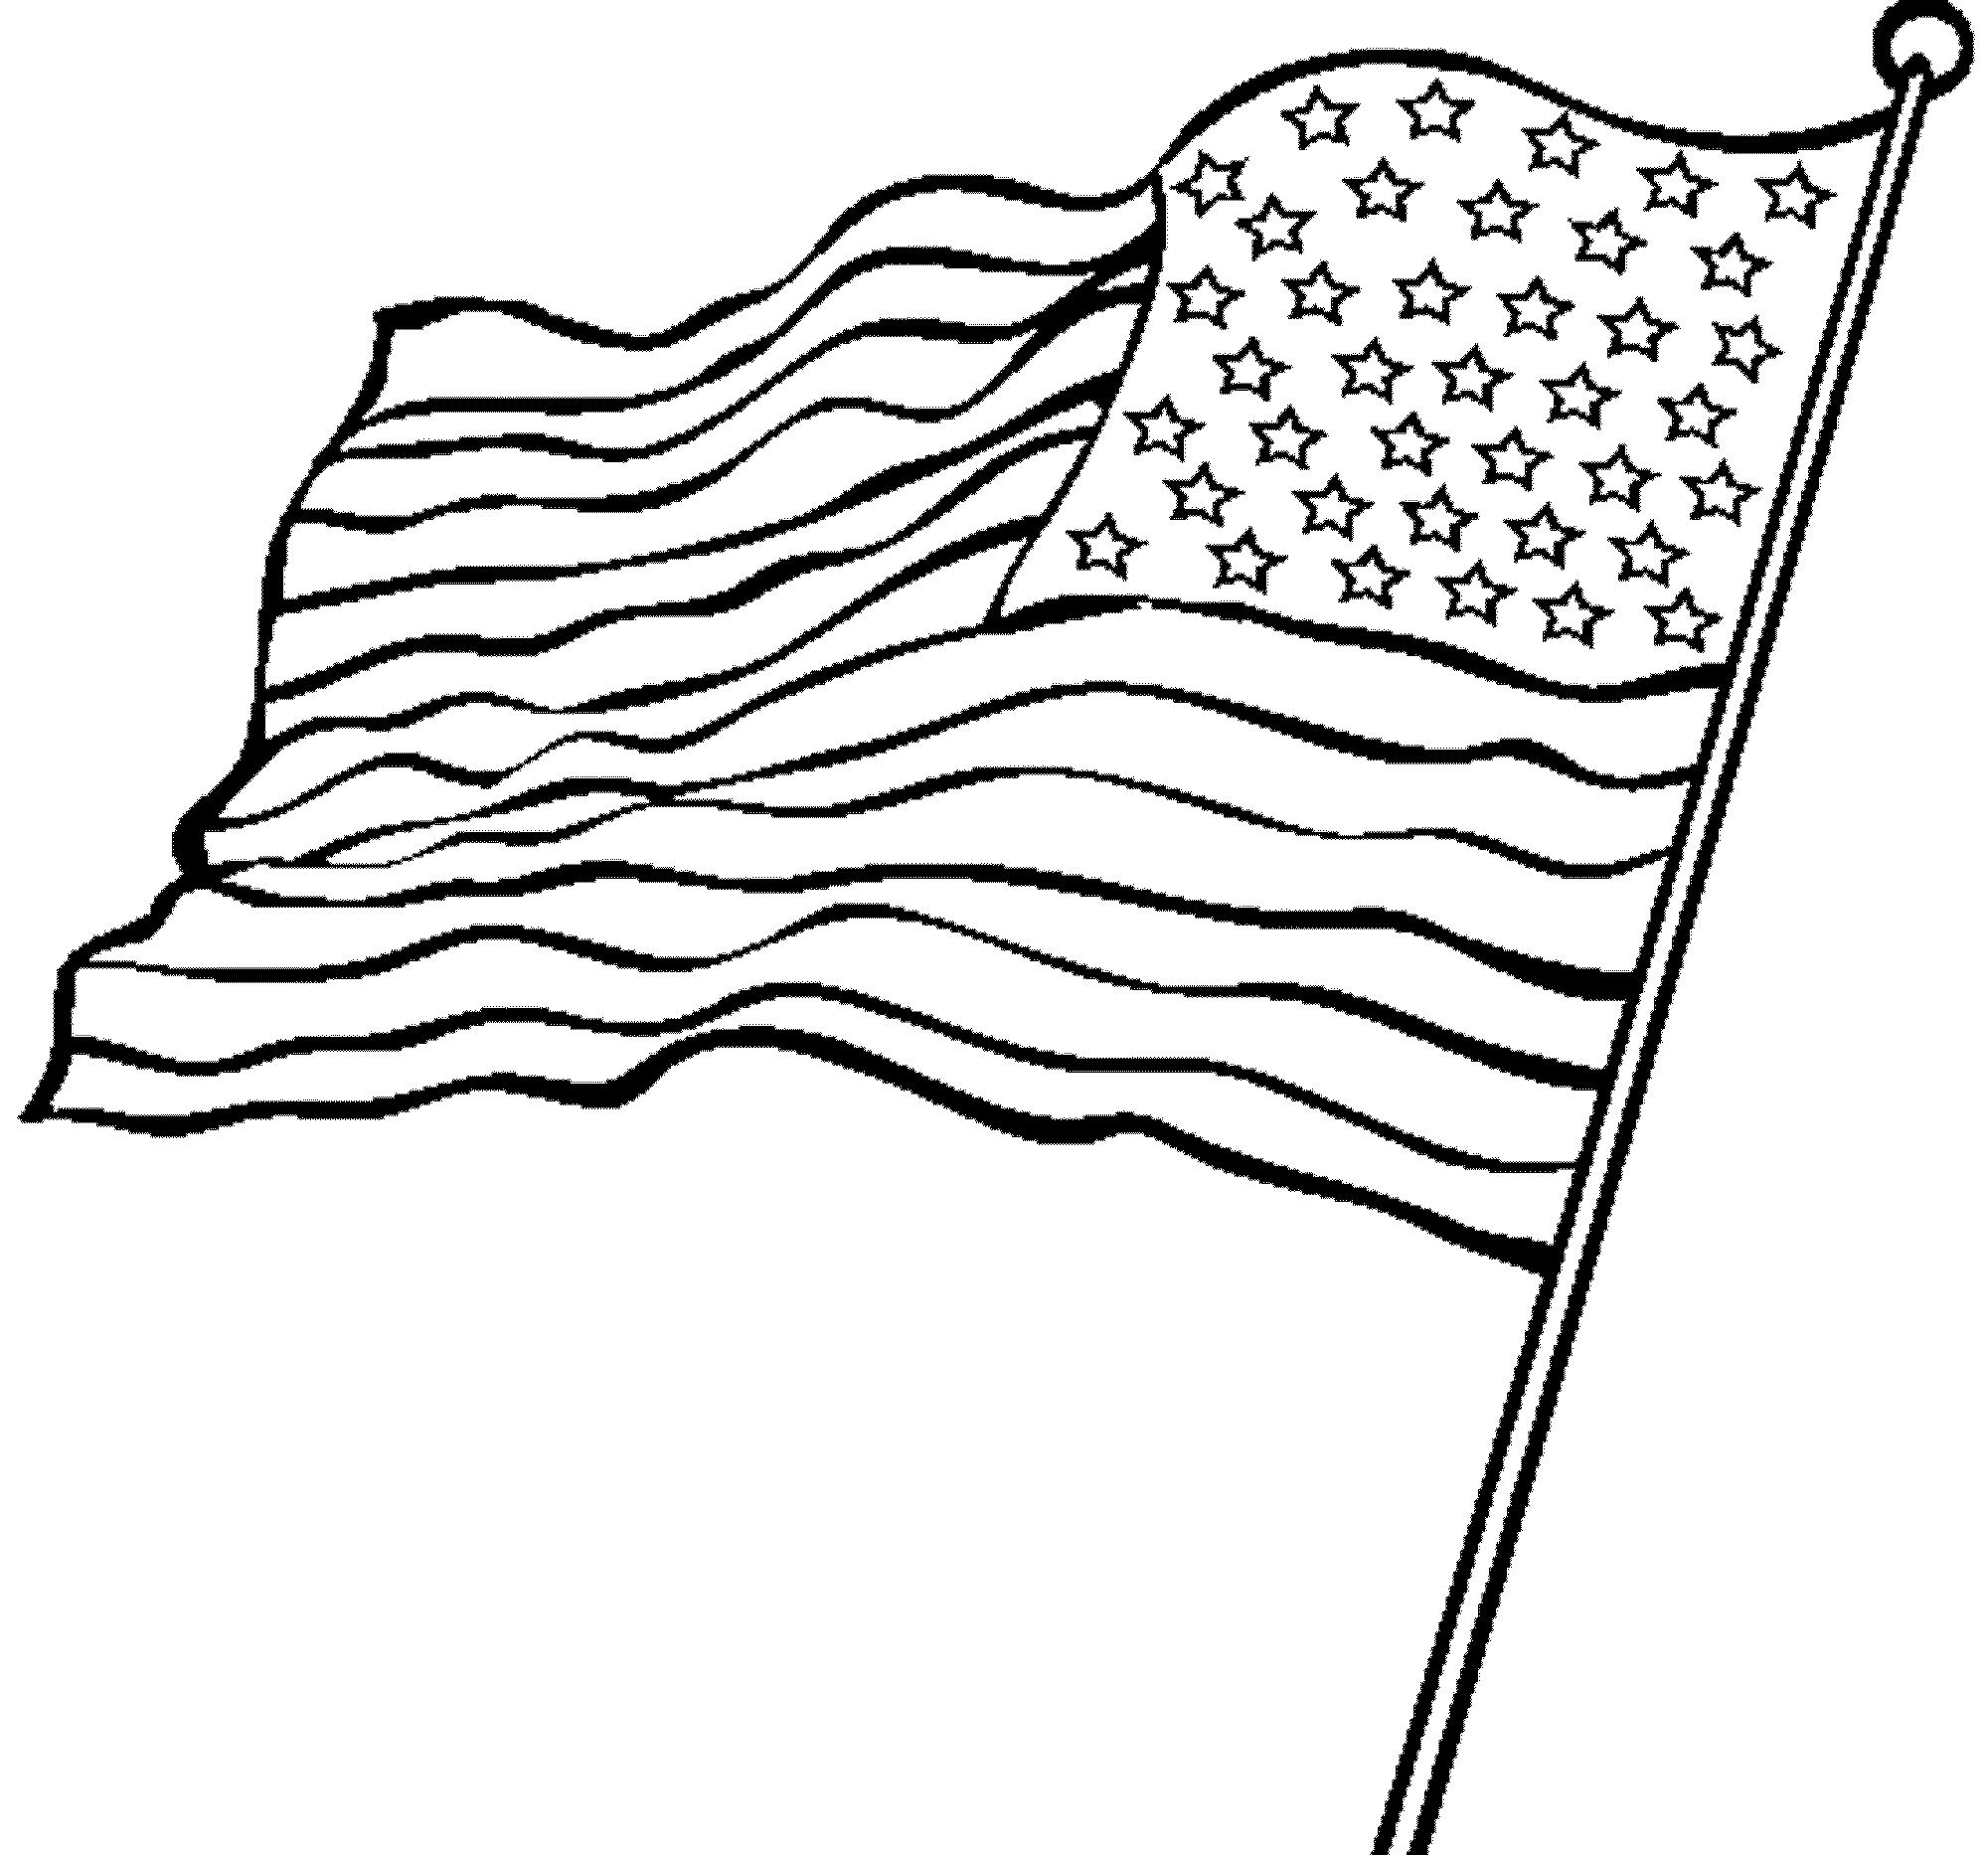 waving american flag coloring page - Printable Kids ...